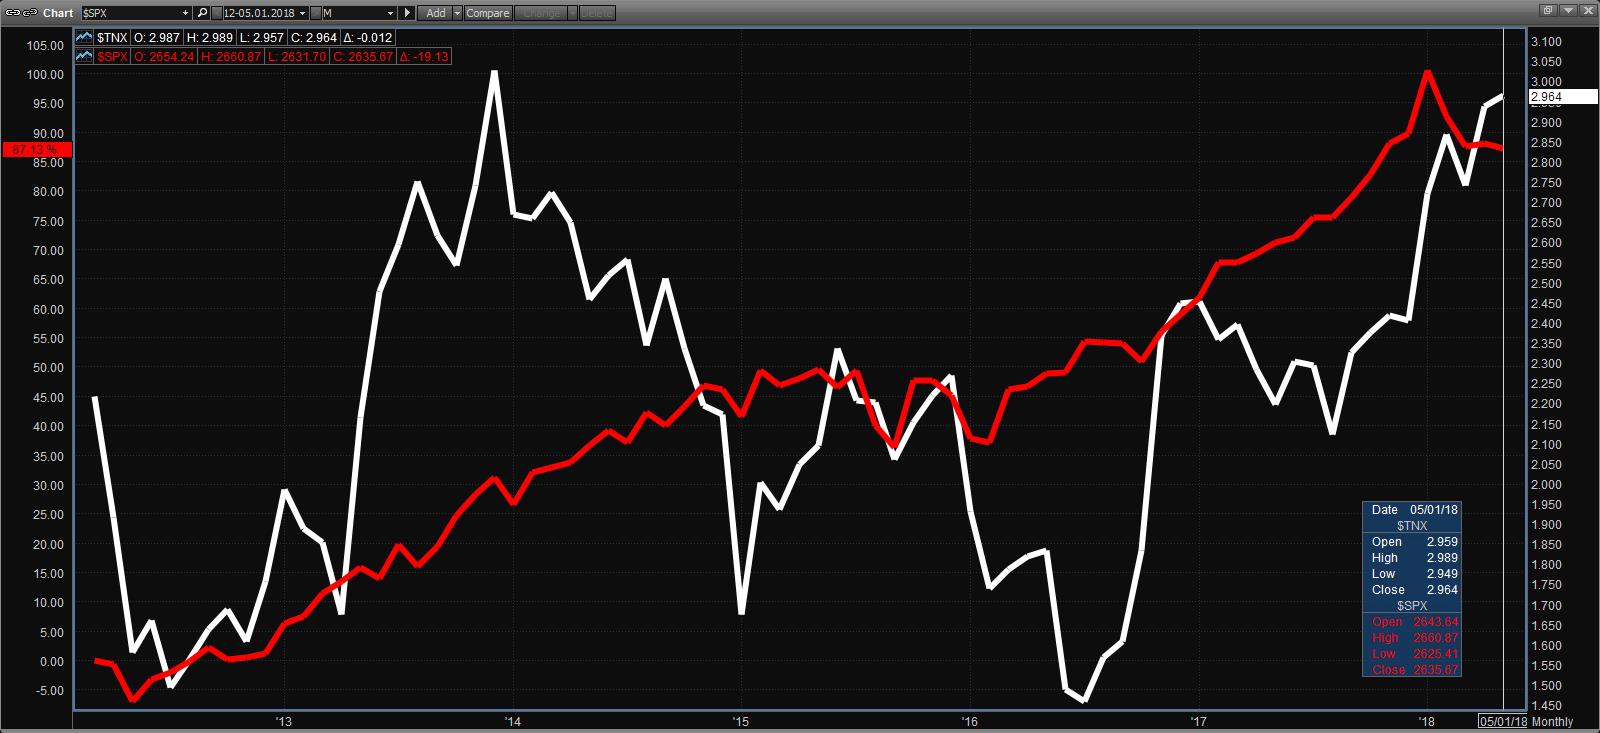 Source: Pershing Market Q; Red line: S&P 500; White line: 10-Year Treasury Yield